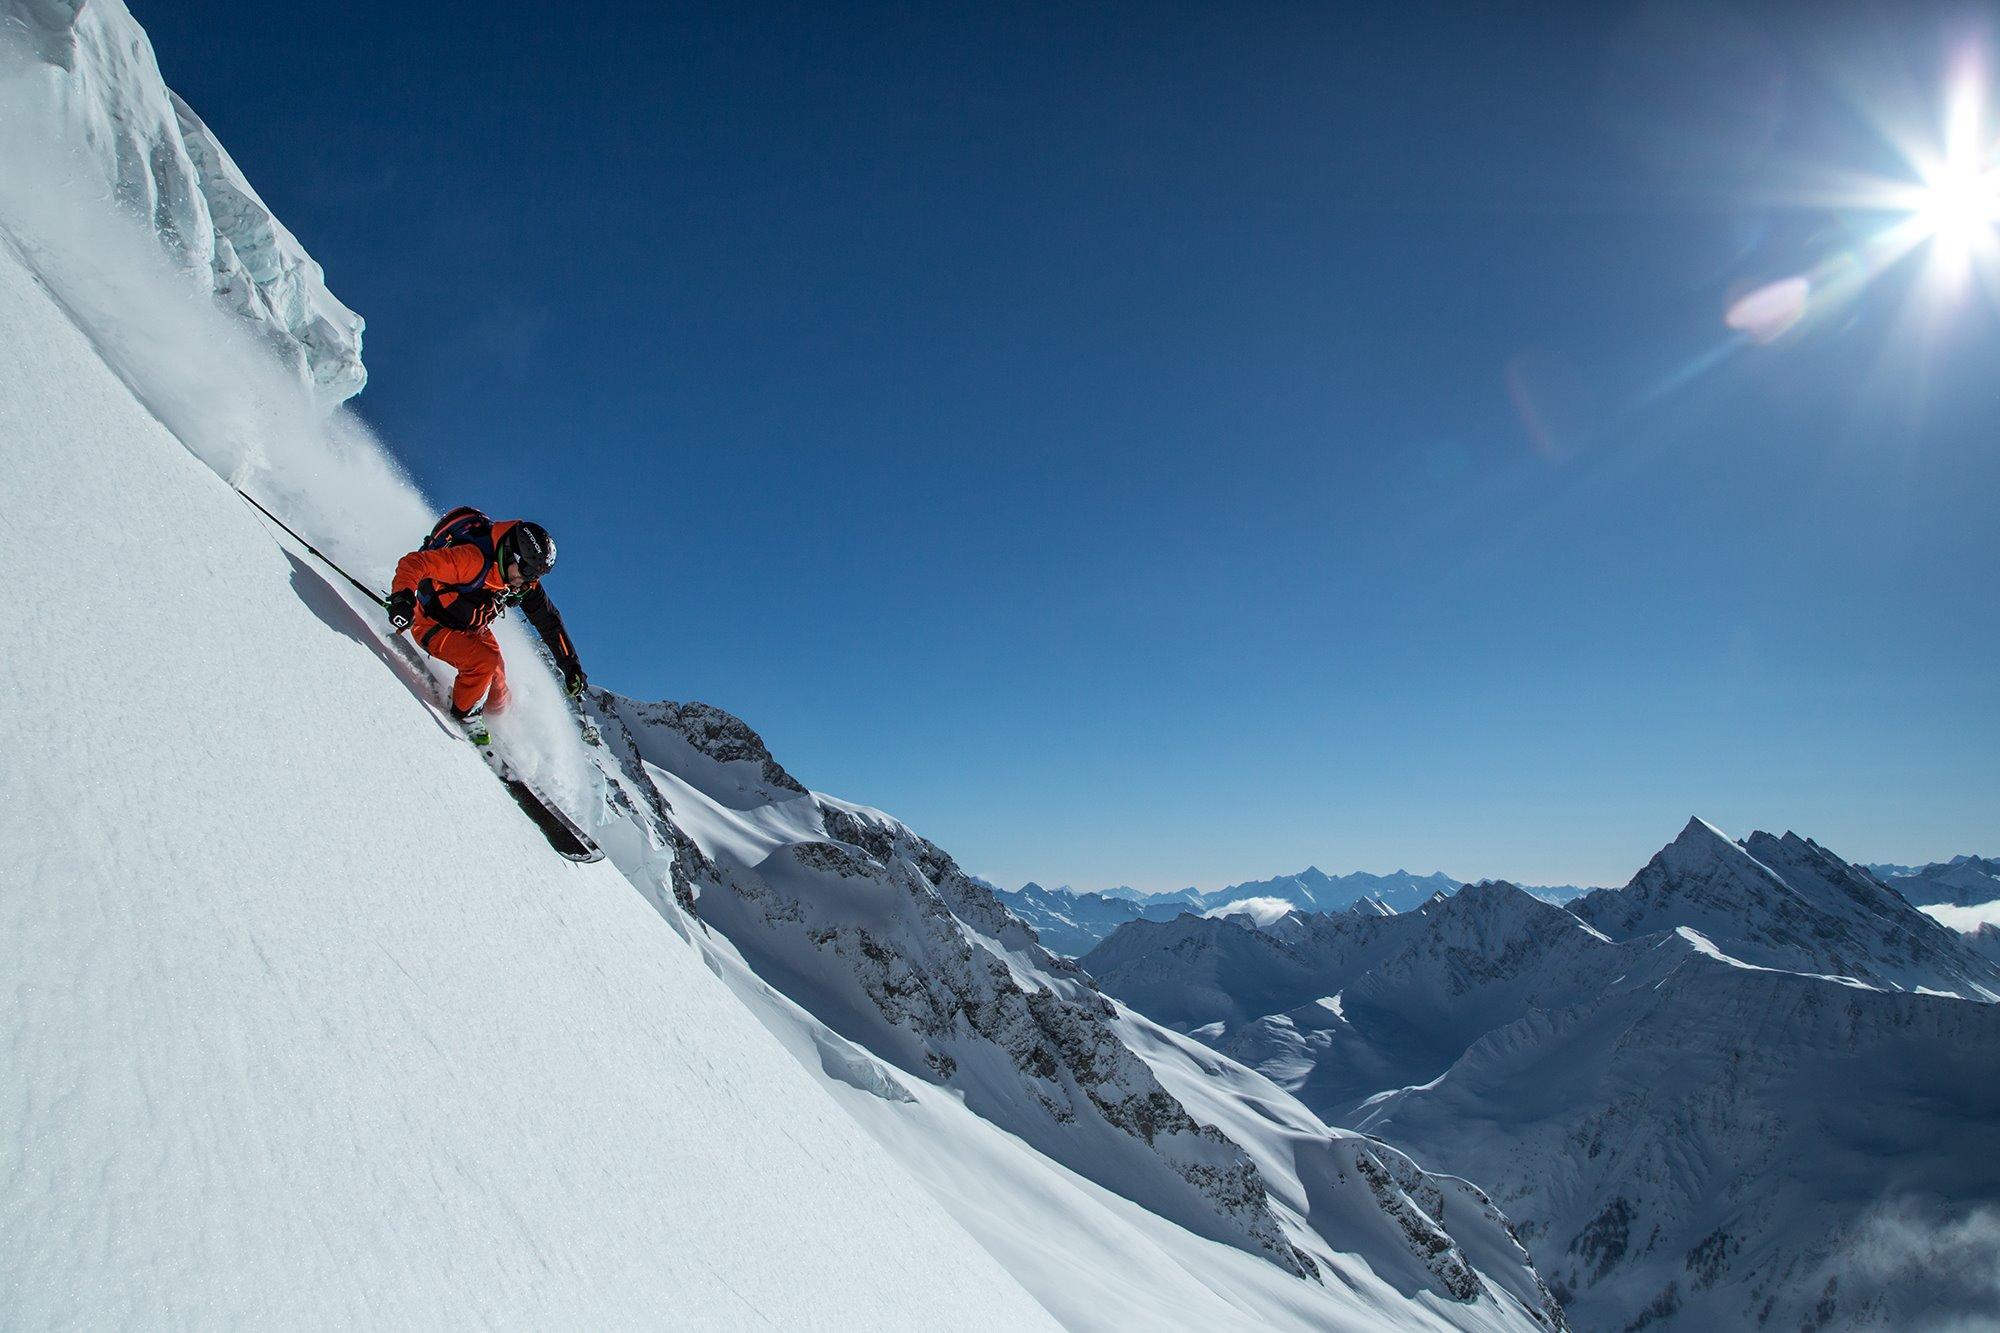 zuba-ski-courmayeur-heliski-weekend-3-flights-004.jpg